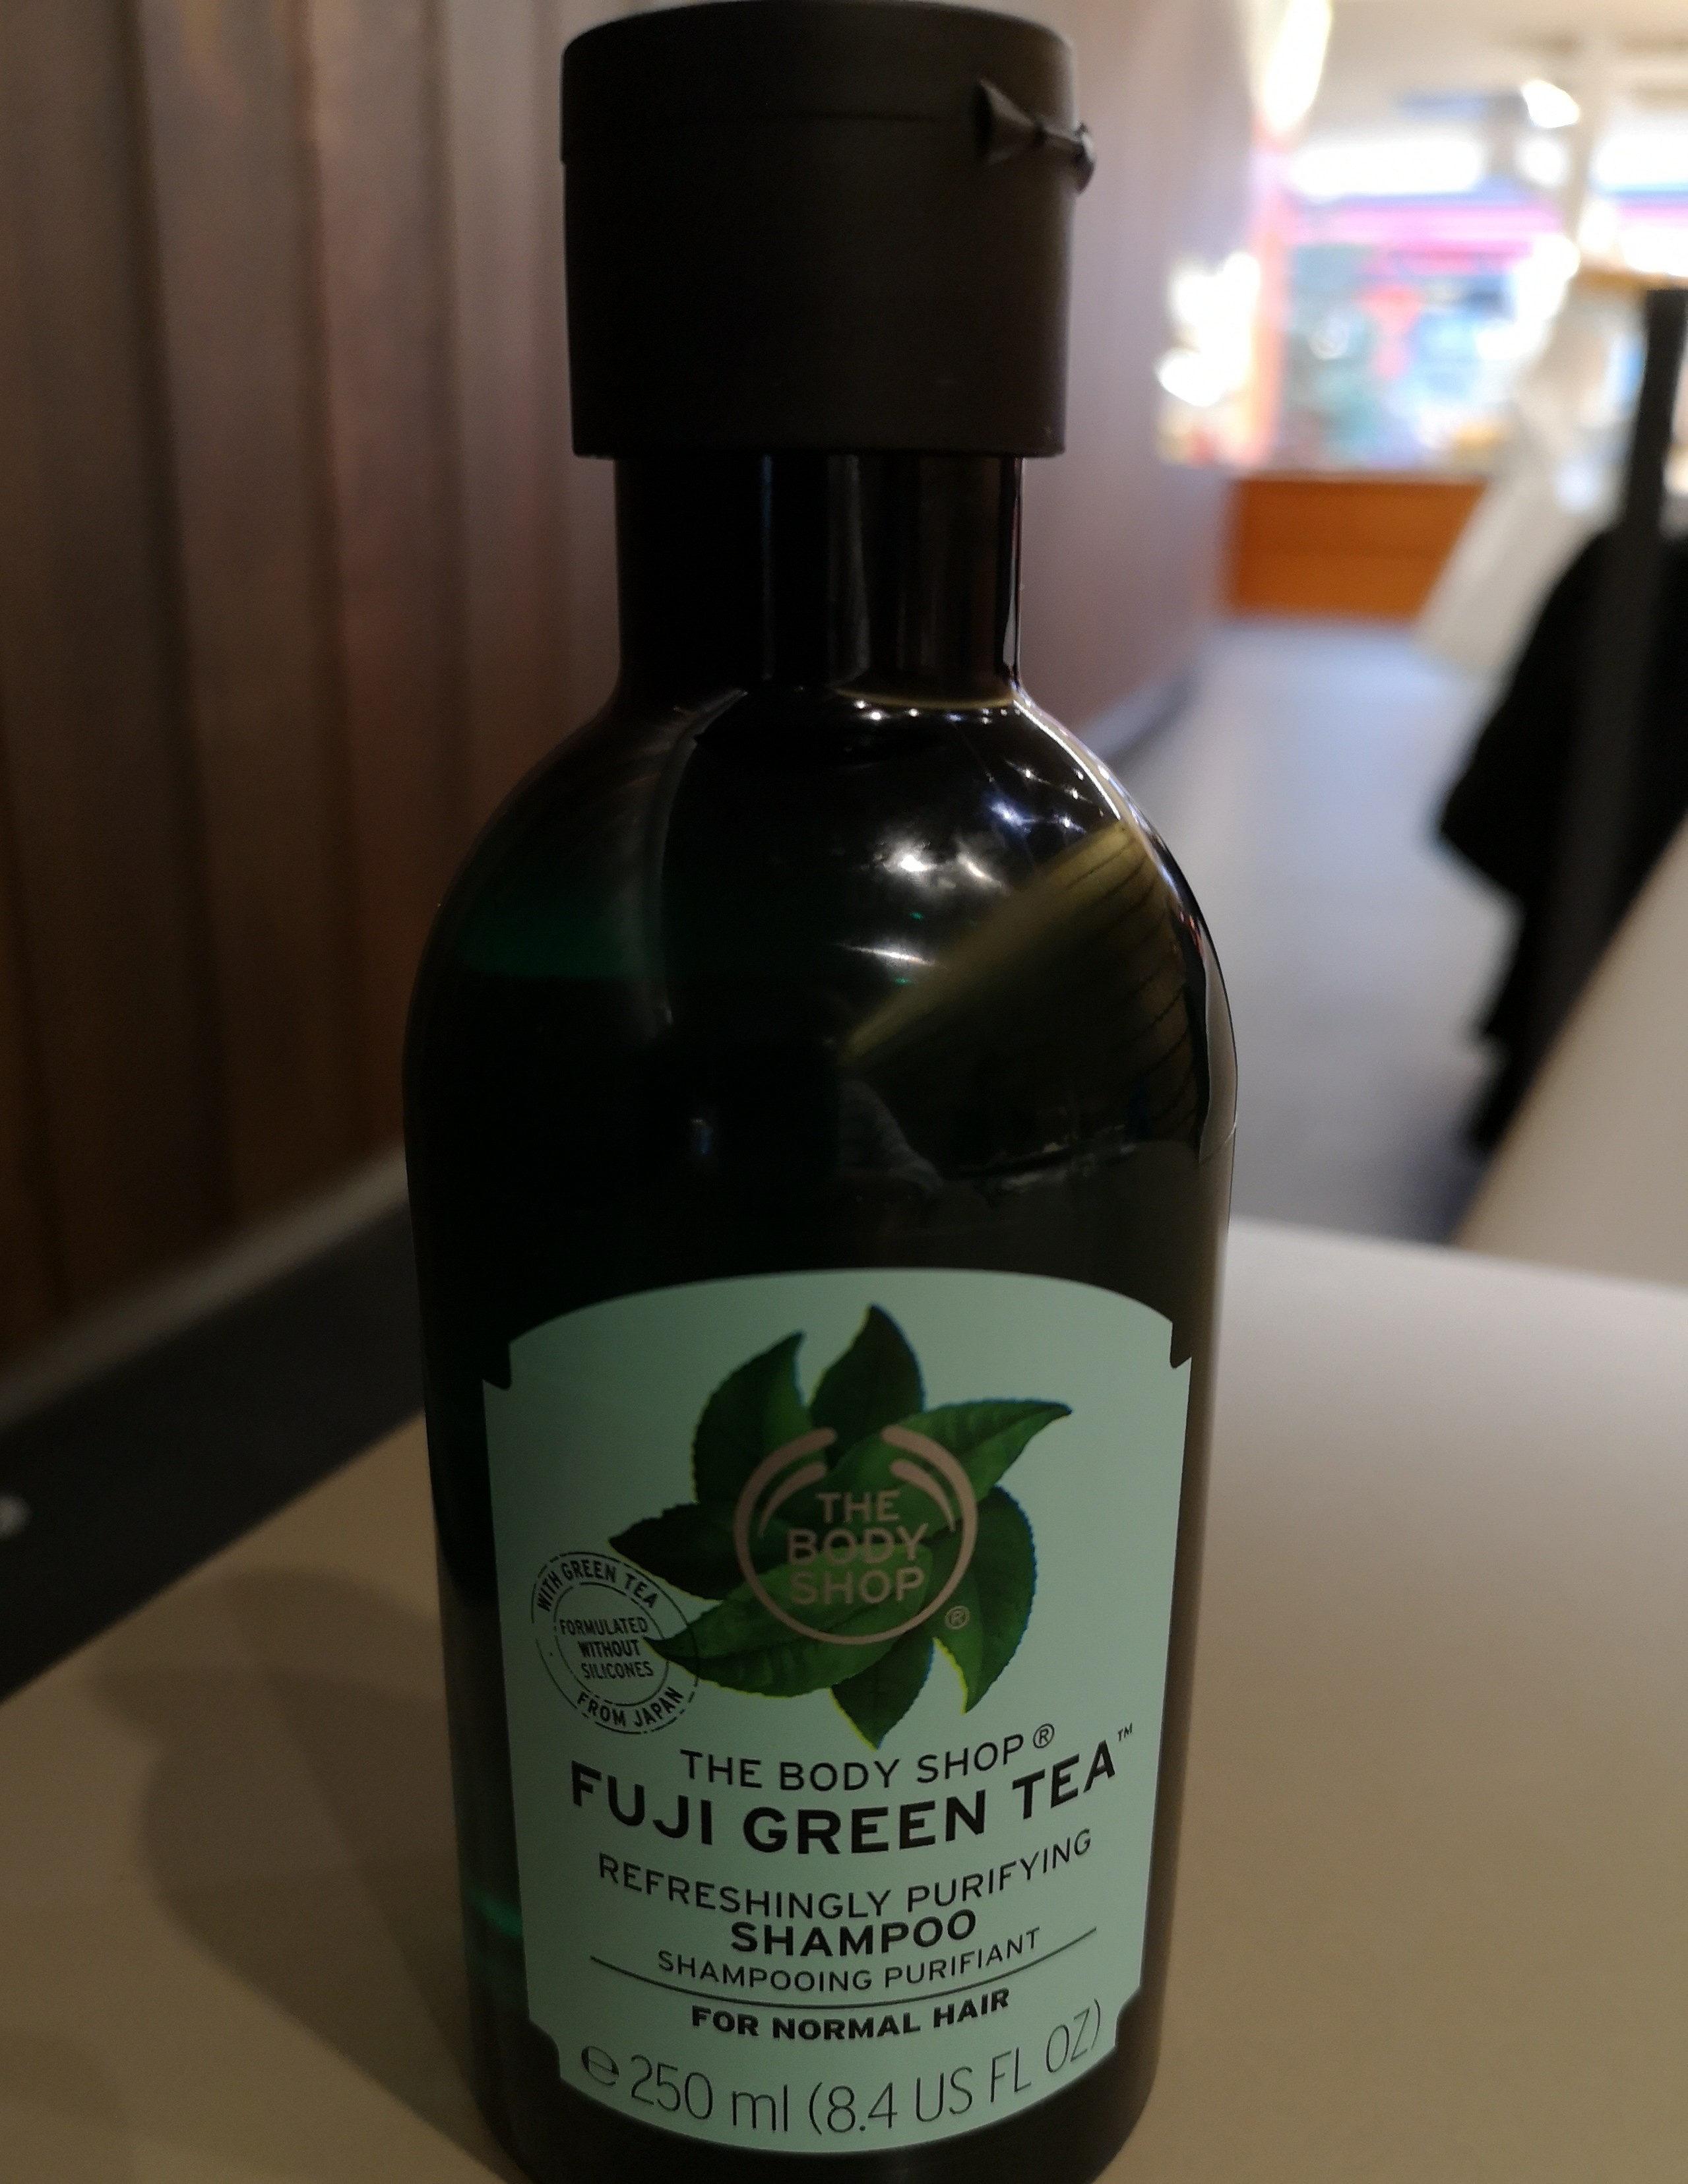 fuji green tea - Product